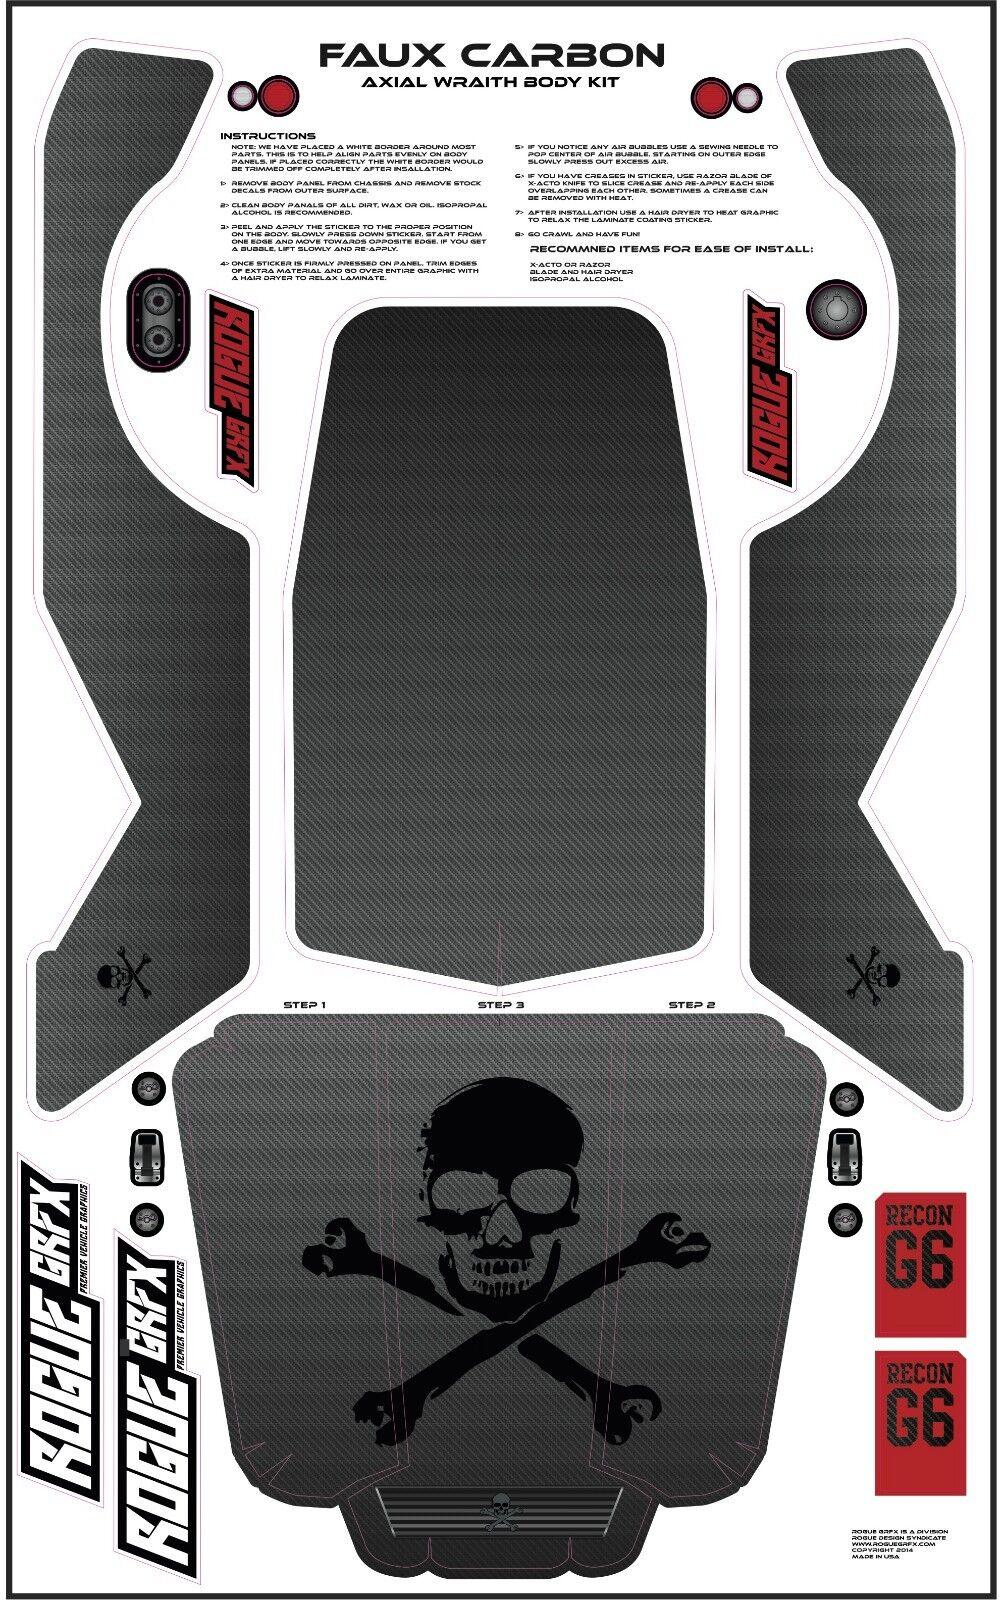 Axial Wraith Graphic Graphic Graphic Wrap- Faux Carbon e4959c